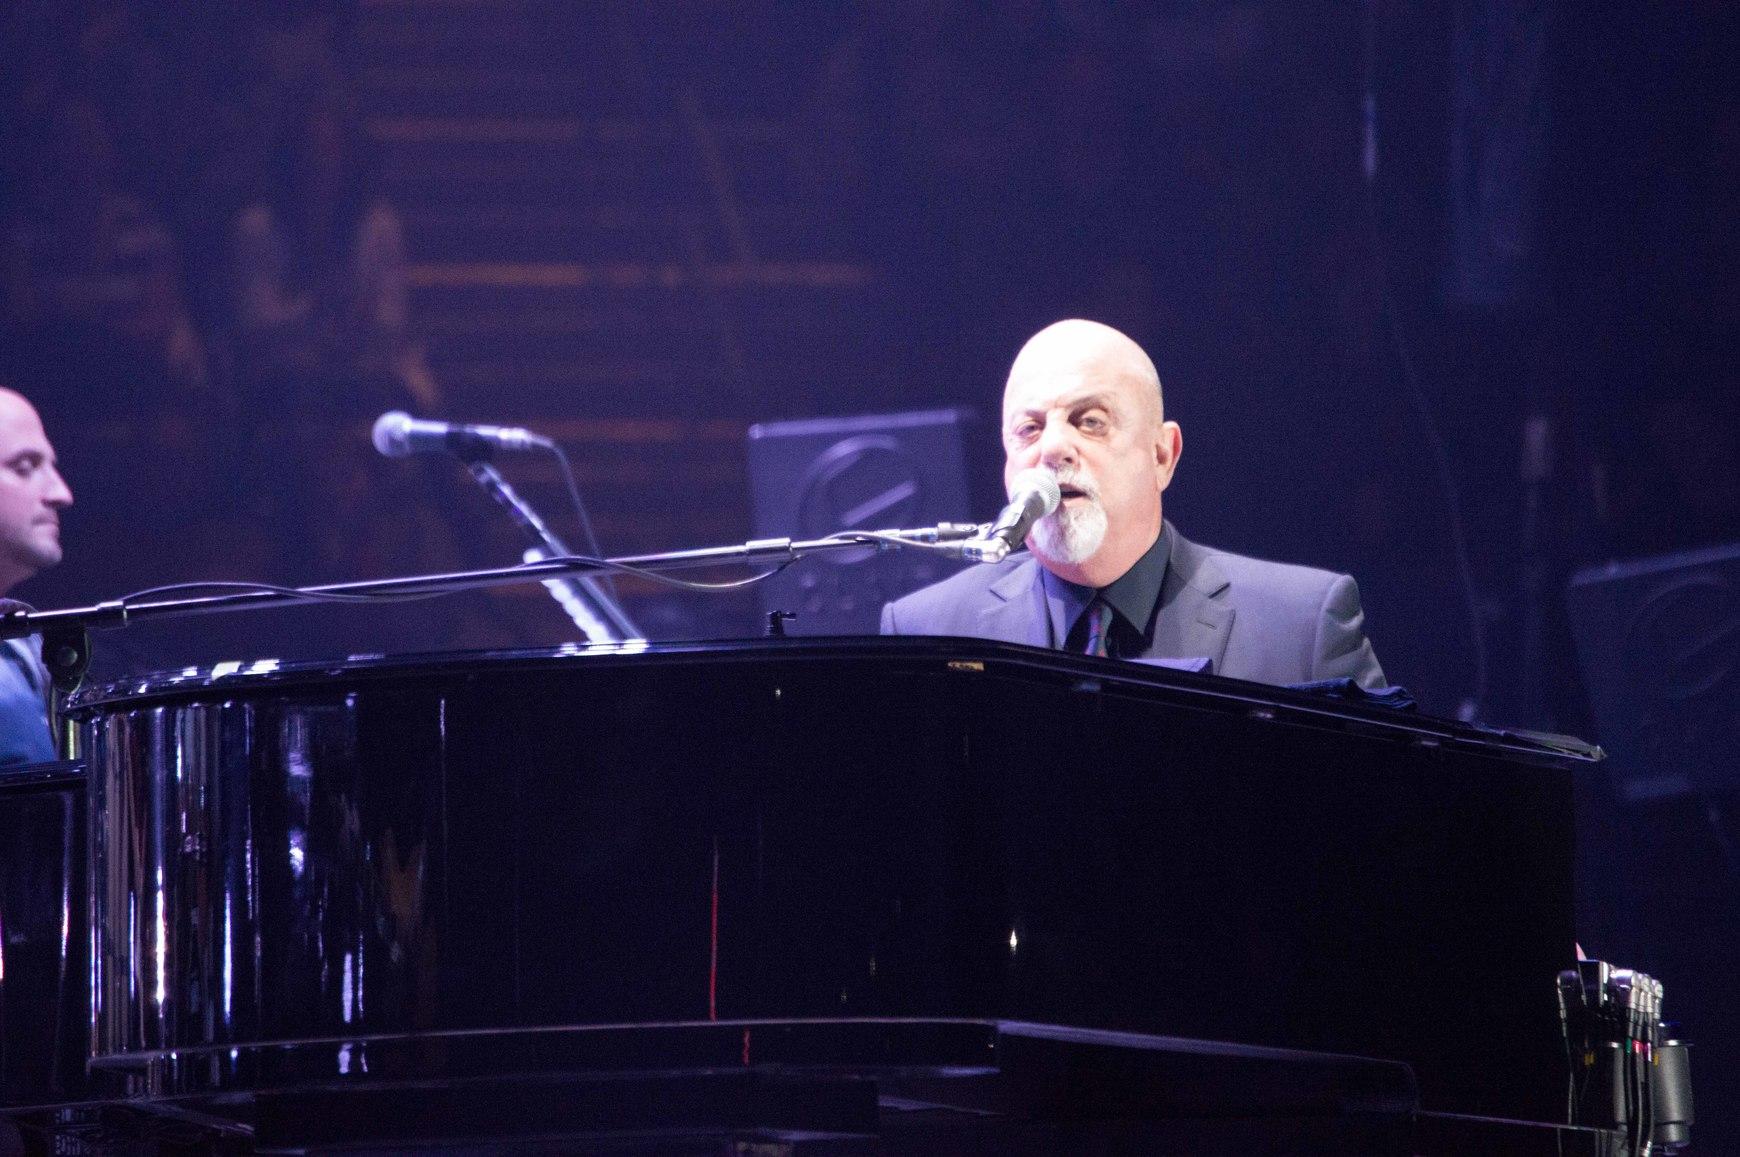 billy joel playing piano - photo #4